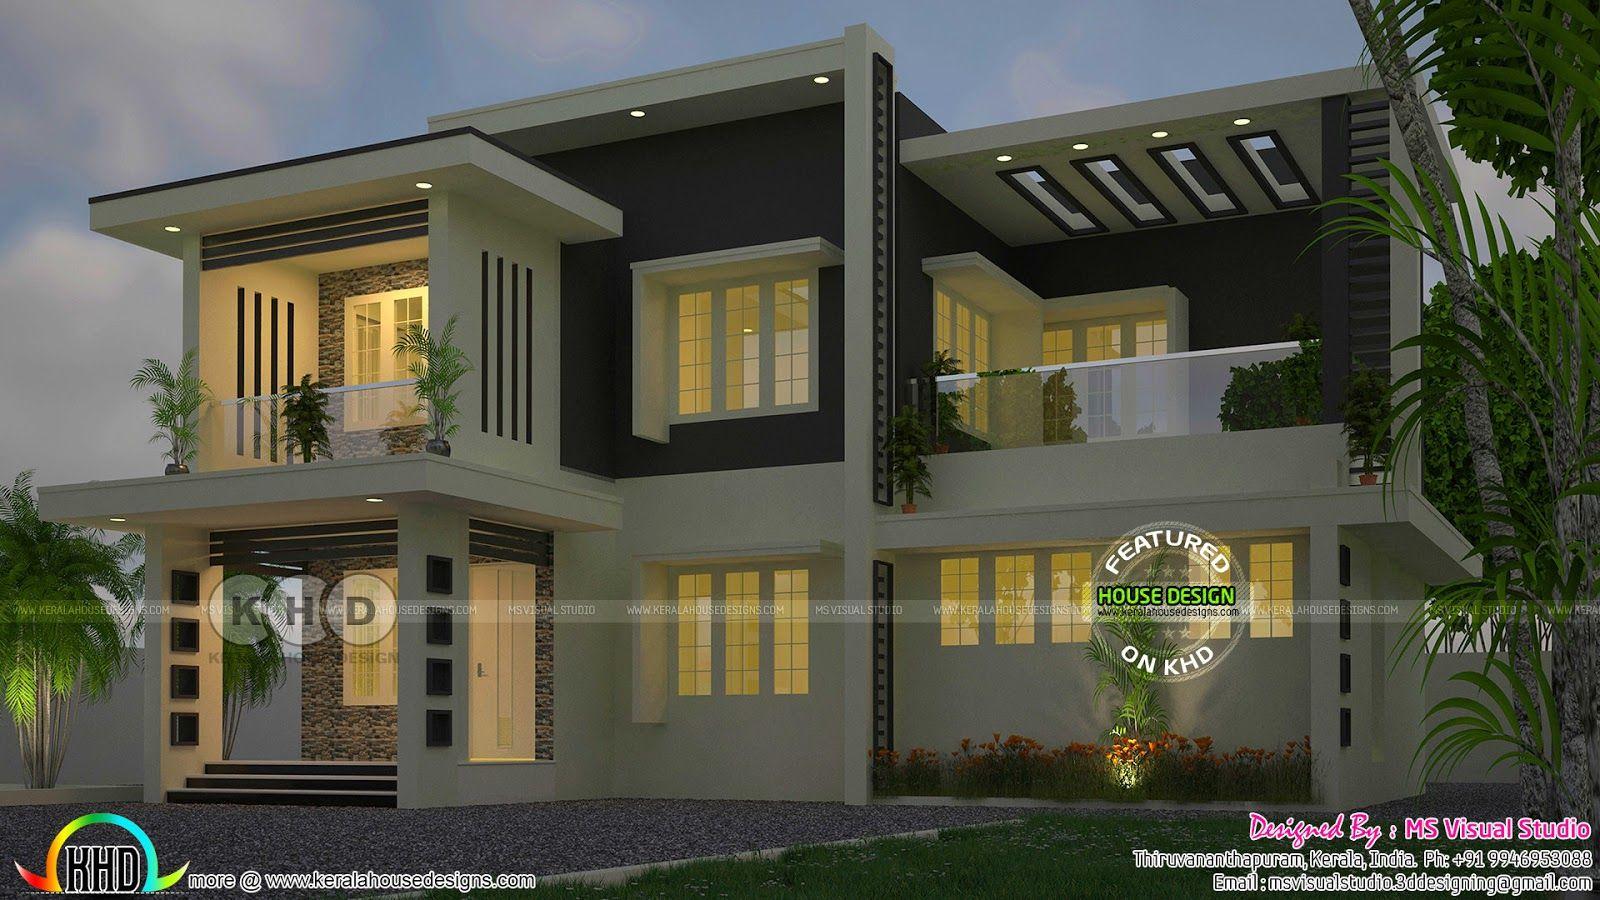 D'life home interiors - kottayam kottayam kerala contemporaryhomeoctg   house design